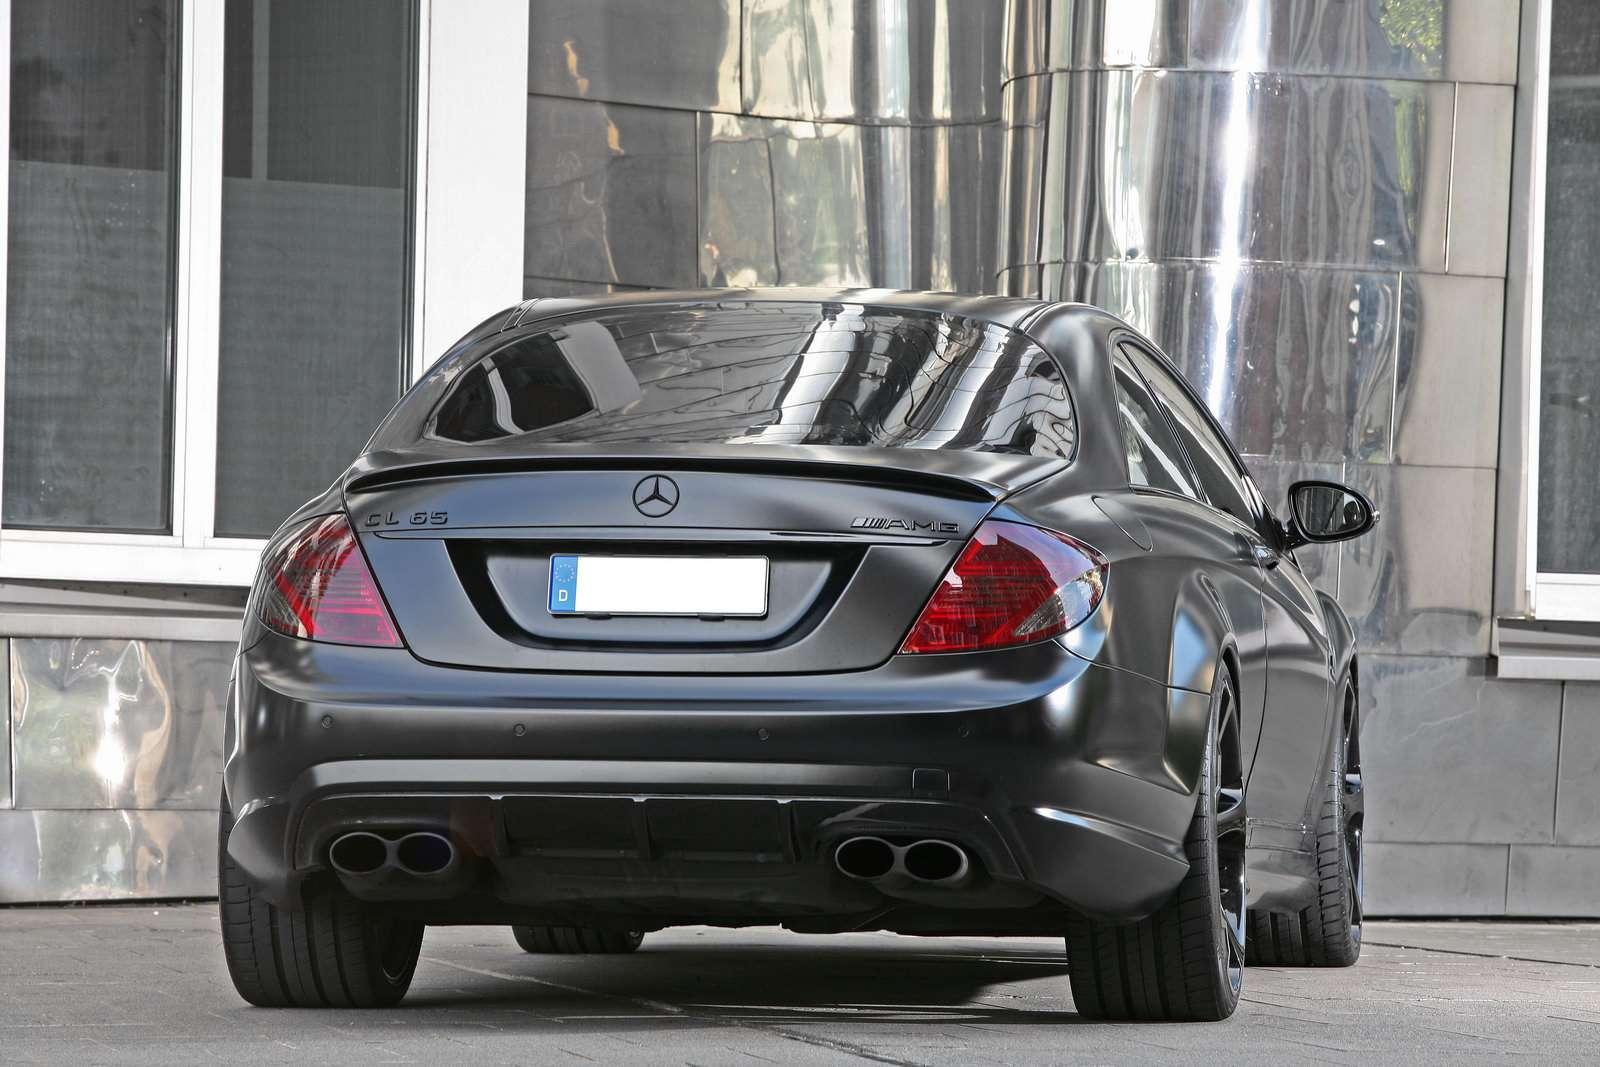 Mercedesa CL65 AMG Black Edition wrzesien 2010